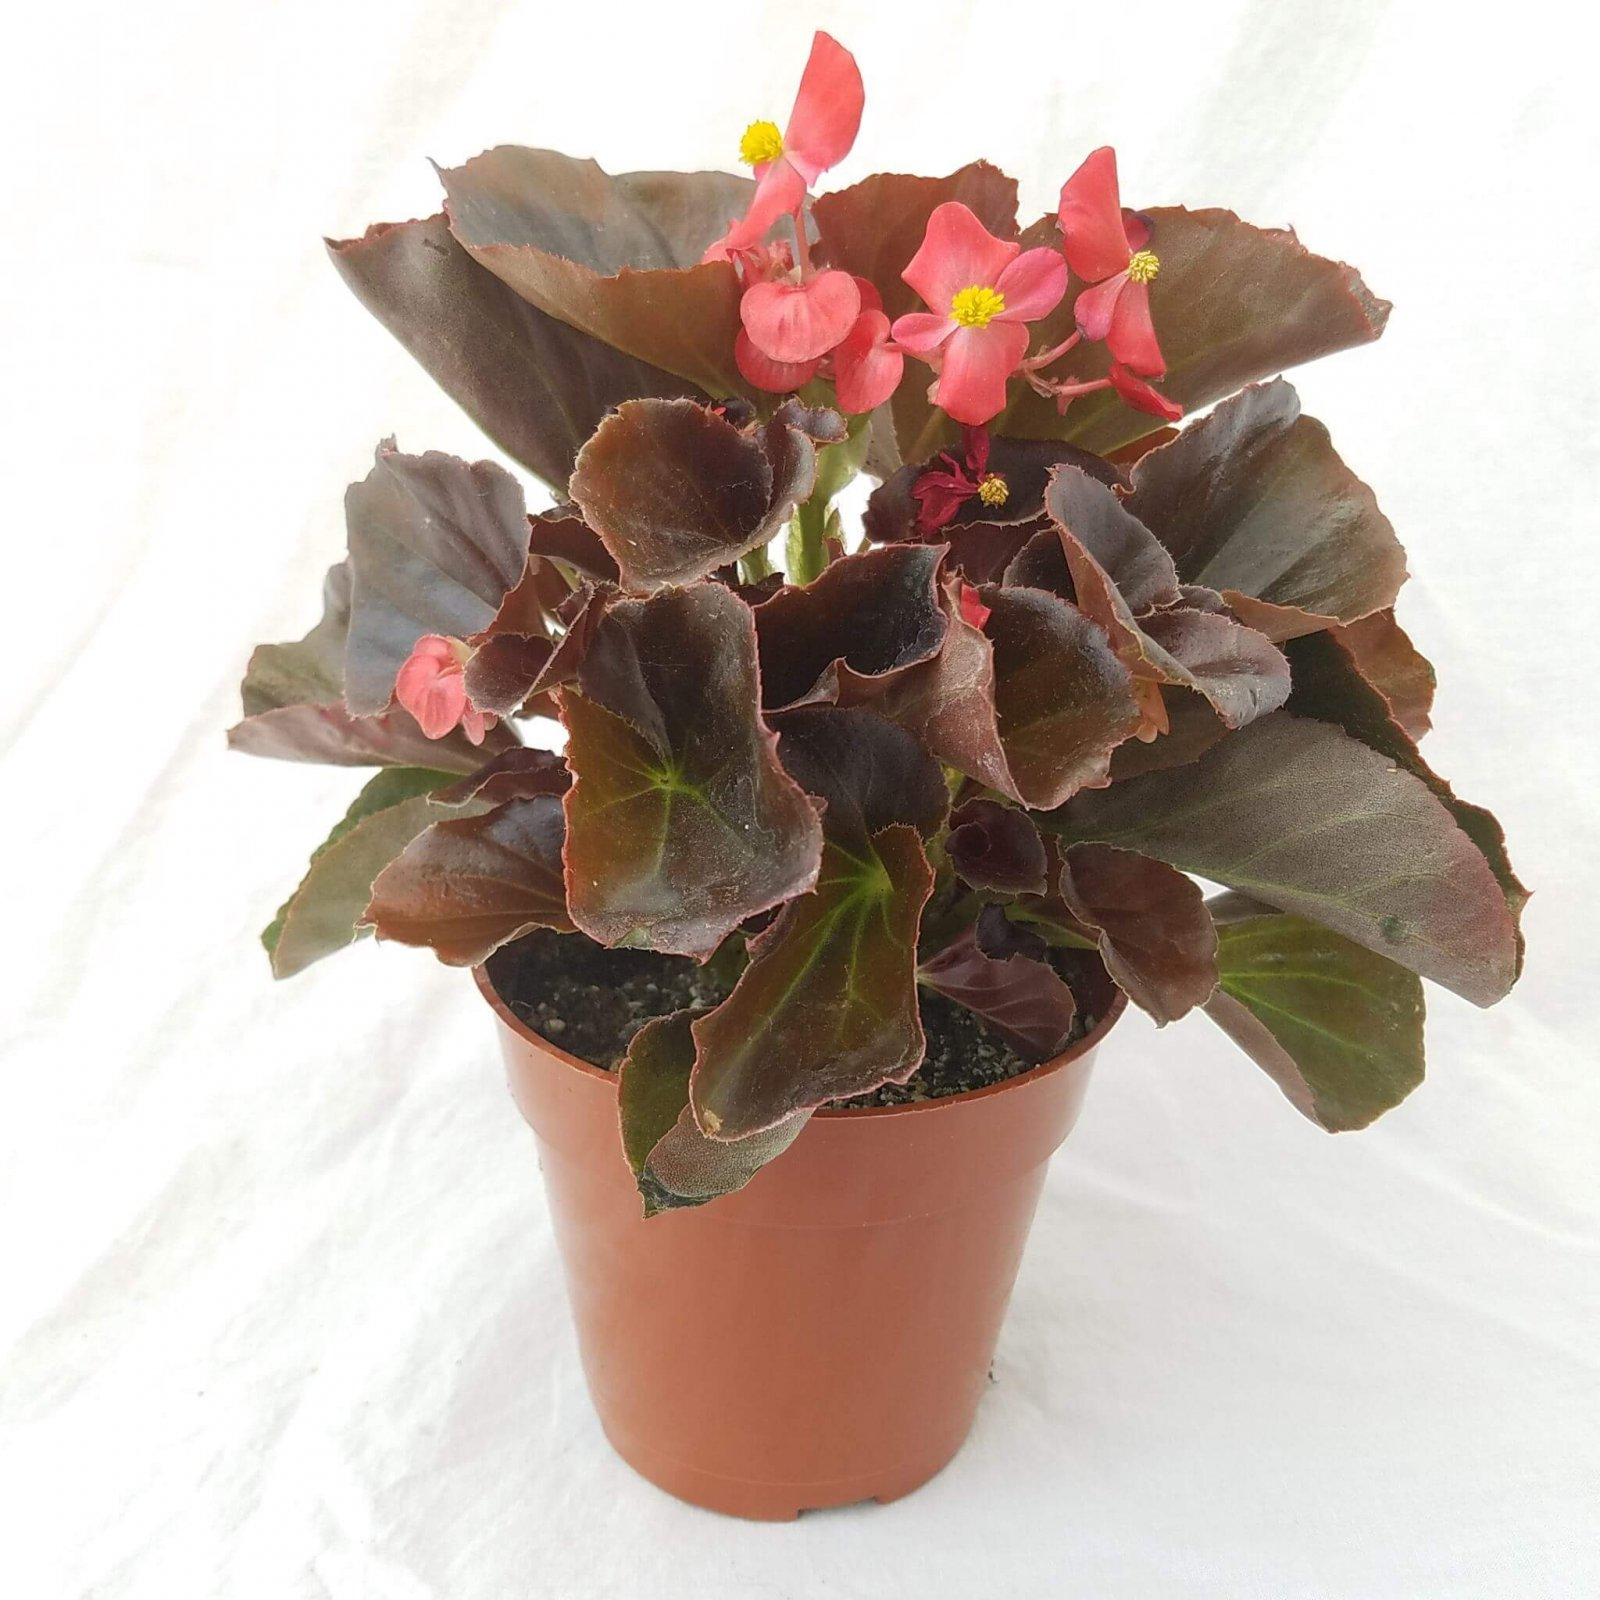 Begonia 'Harmony Scarlet' (Bronze Leaf) - 4 1/2